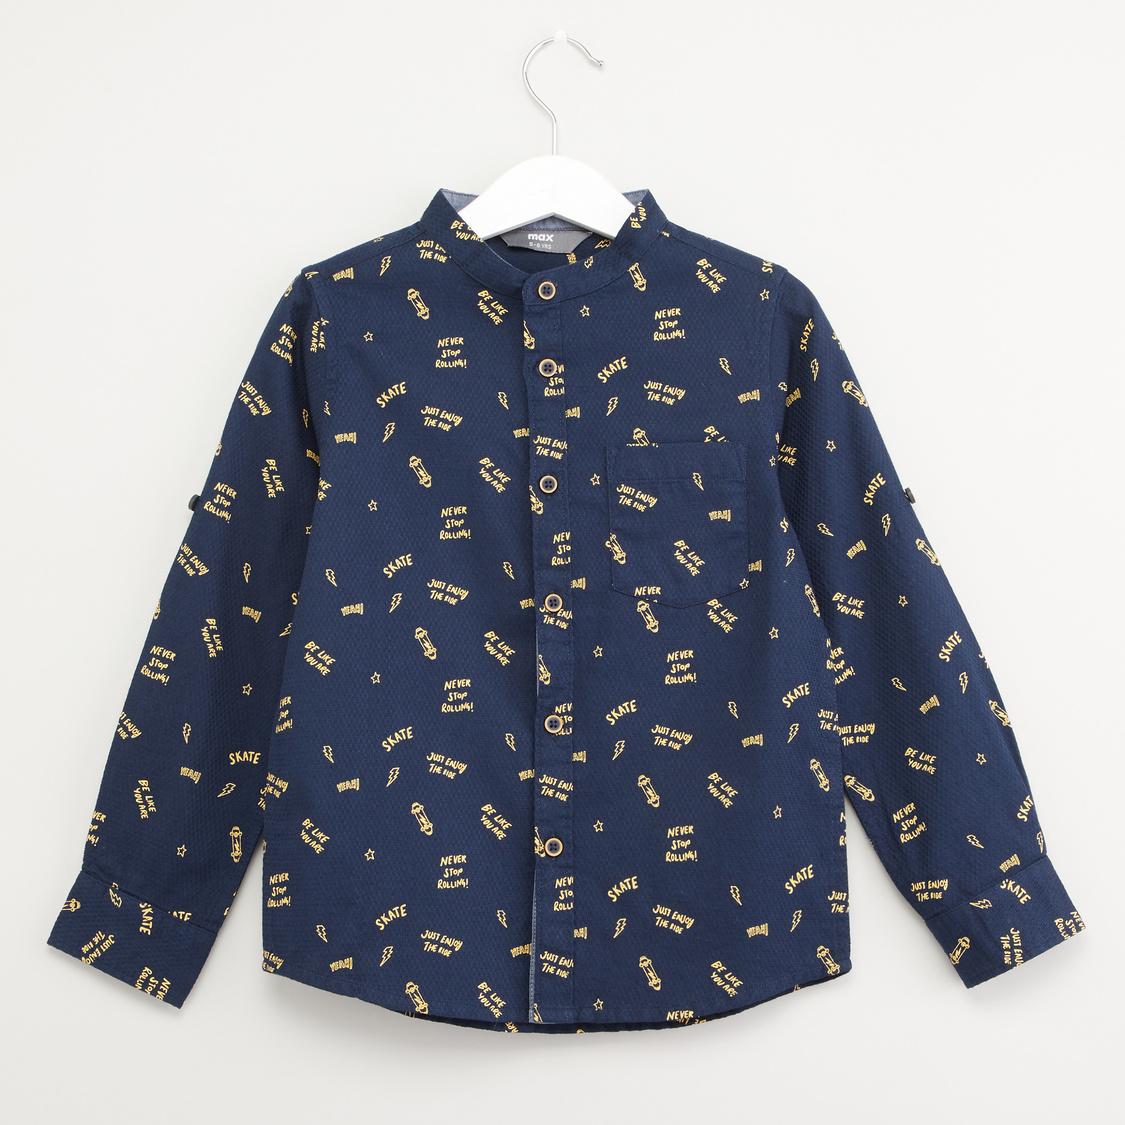 Text Print Shirt with Mandarin Neck and Long Sleeves